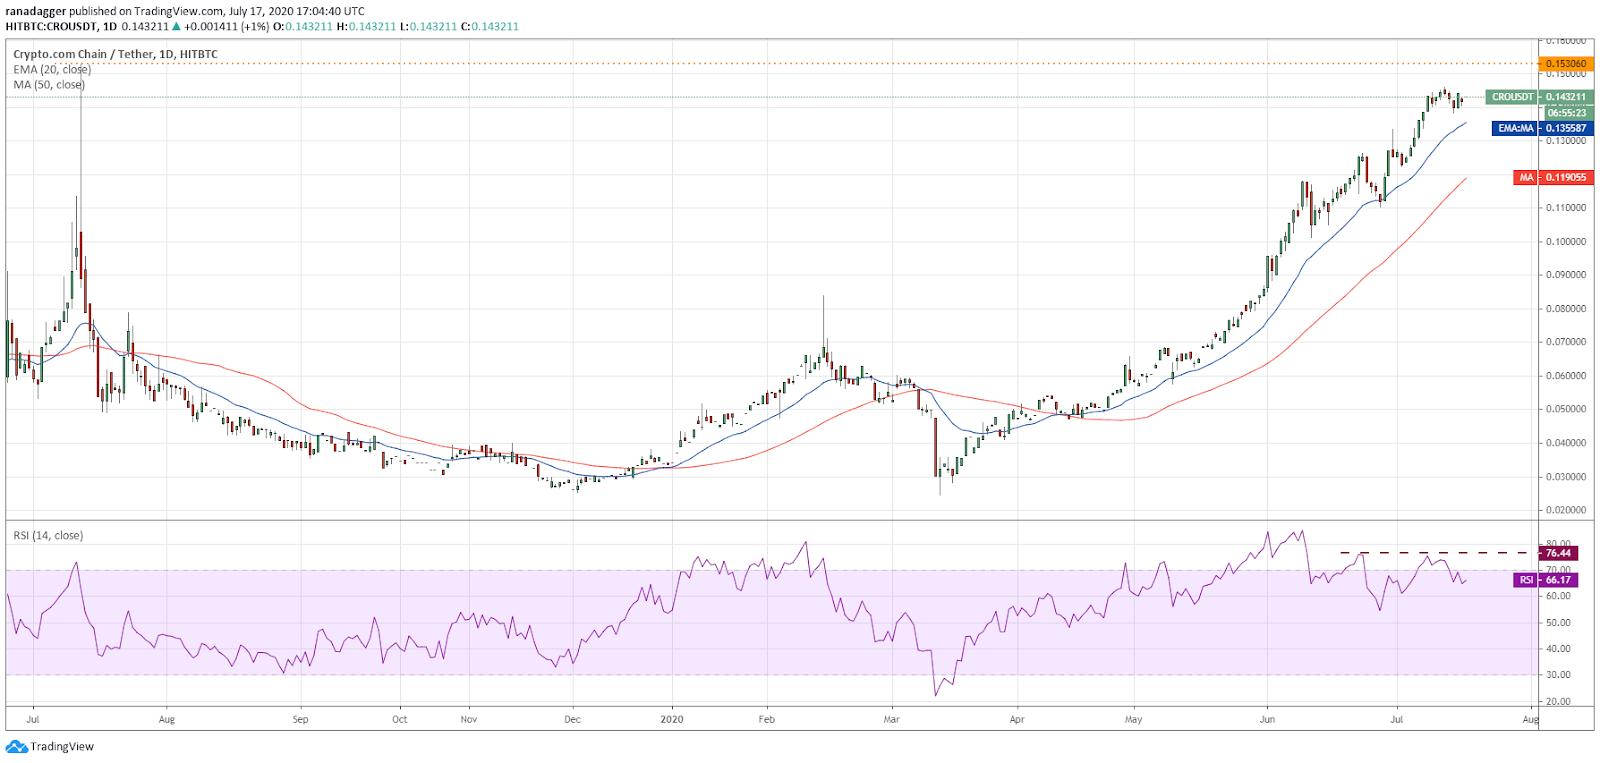 CRO/USD daily chart. Source: TradingView